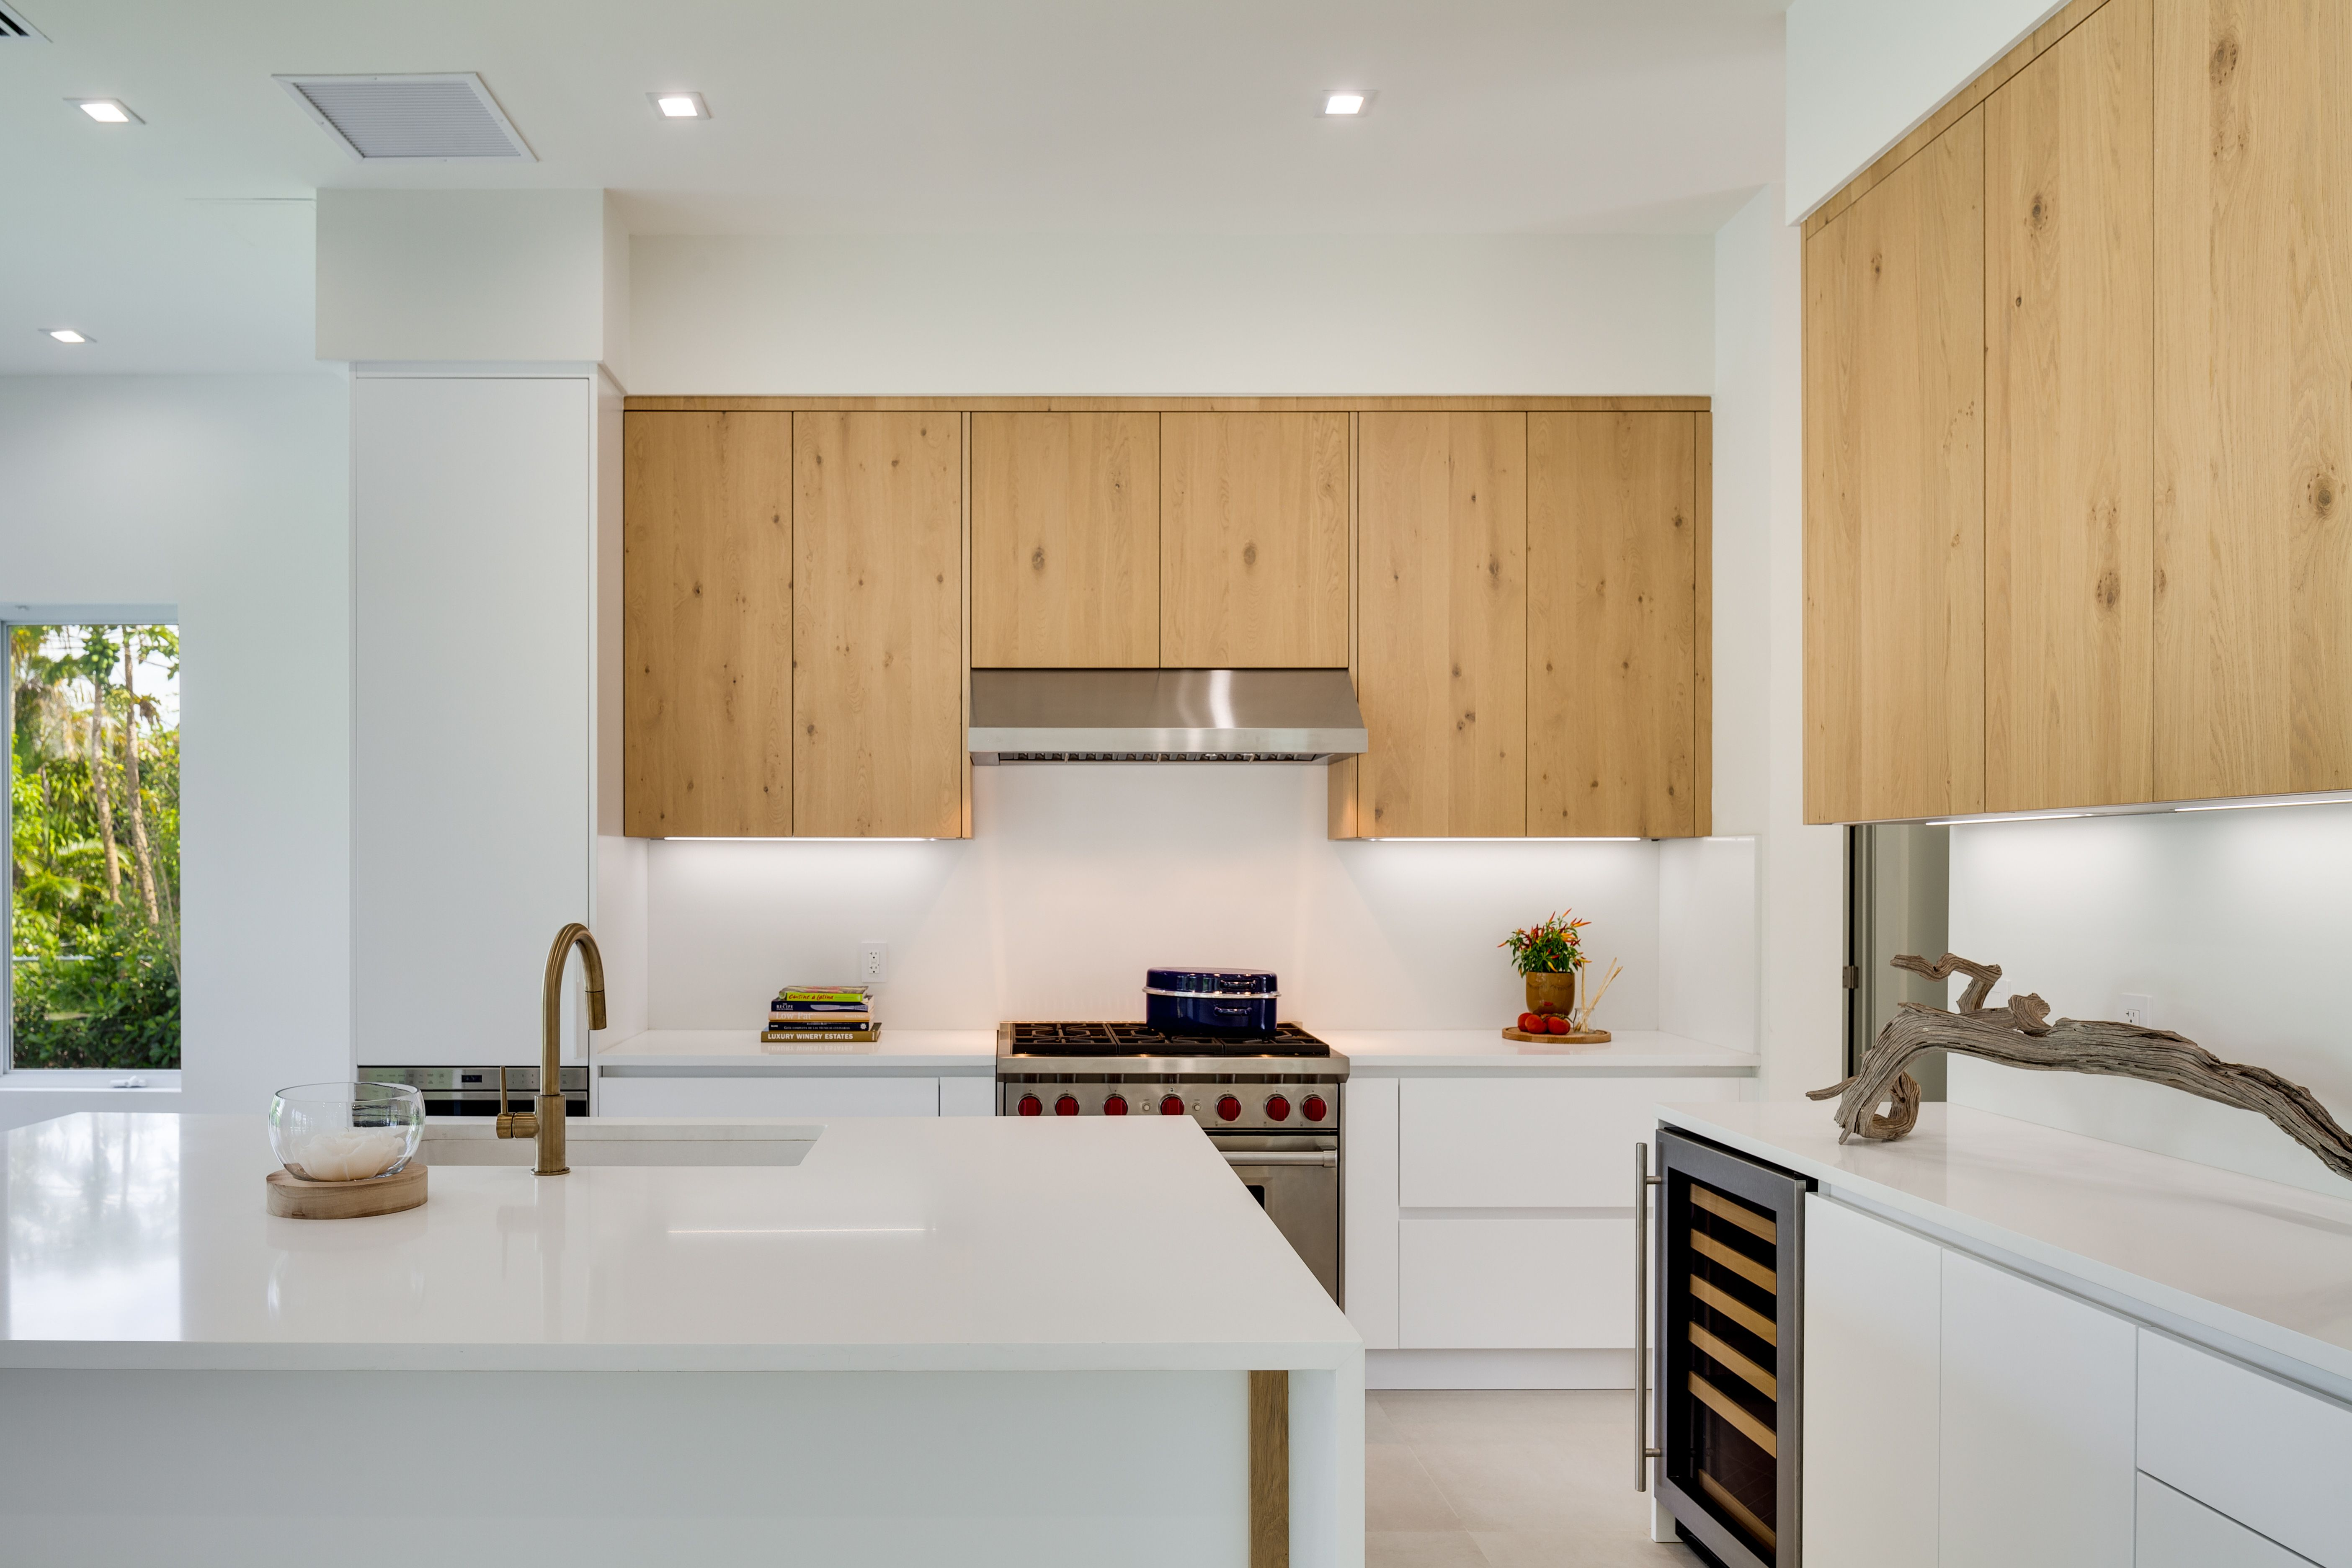 Italkraft Kitchens Kitchen Customdesign Luxuryrealestate Interiordesign Designer Italiandesign Kitchendesign Kitchen Custom Kitchens Kitchen And Bath